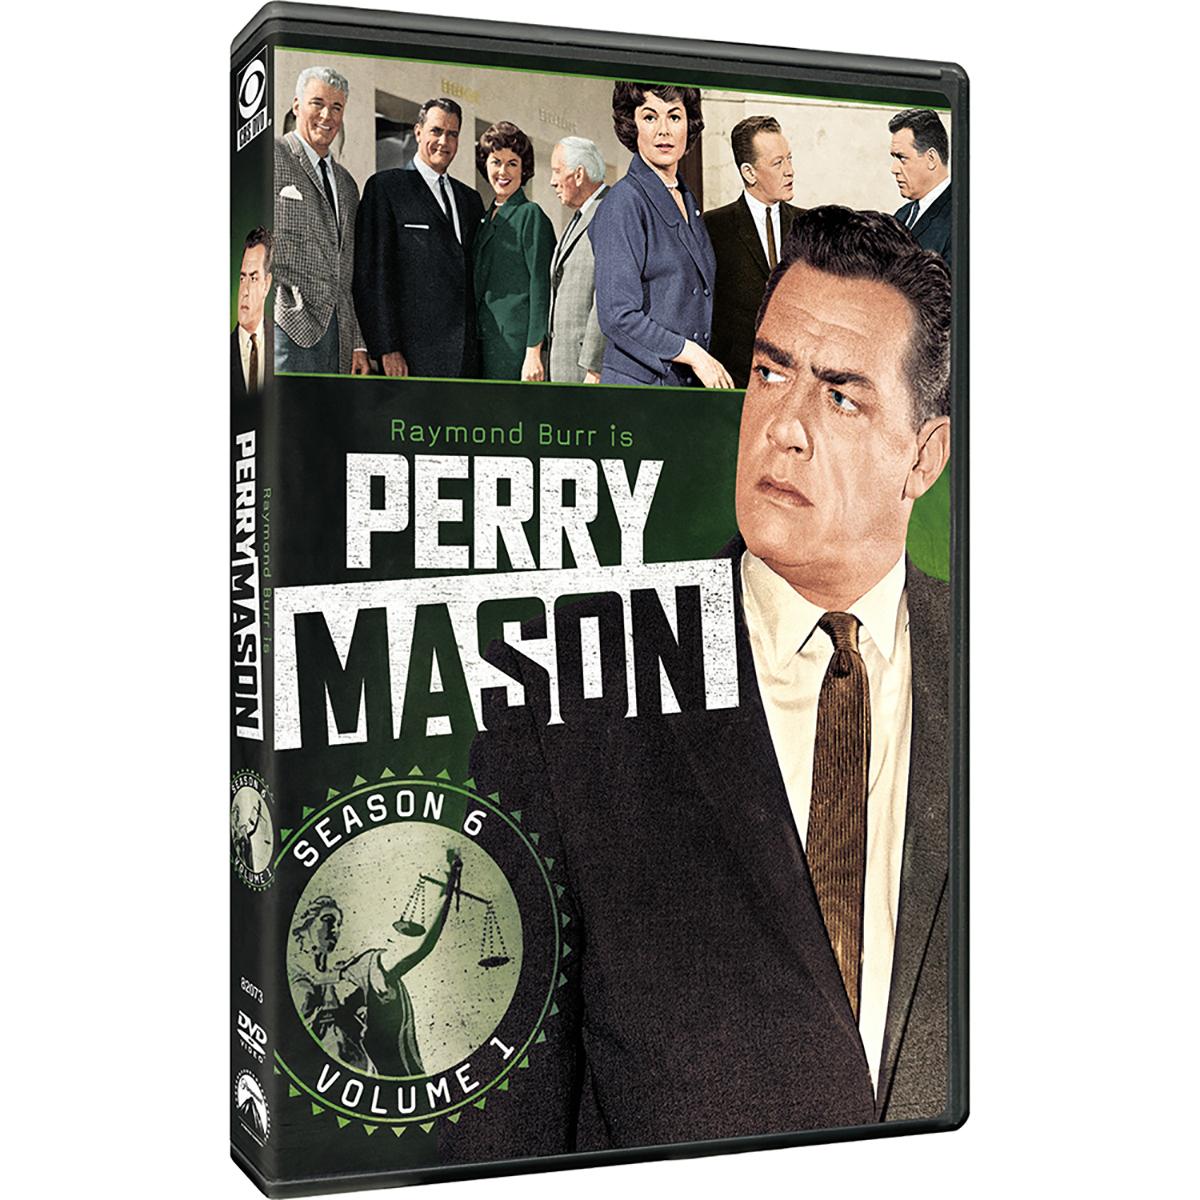 Perry Mason: Season 6 - Volume 1 DVD